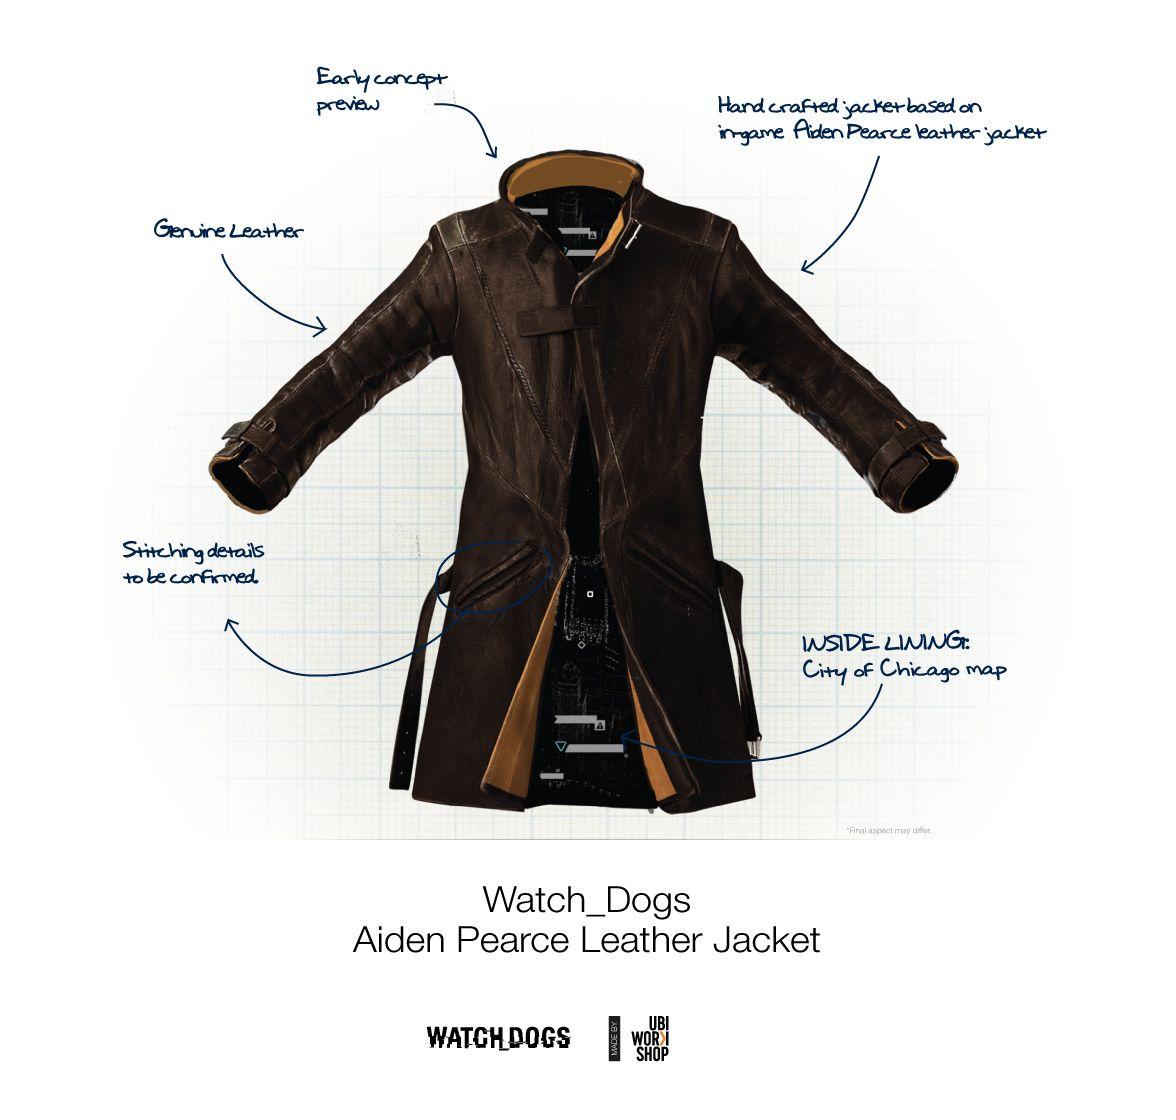 Ubiworkshop Watch Dogs Aiden Pearce leather jacket